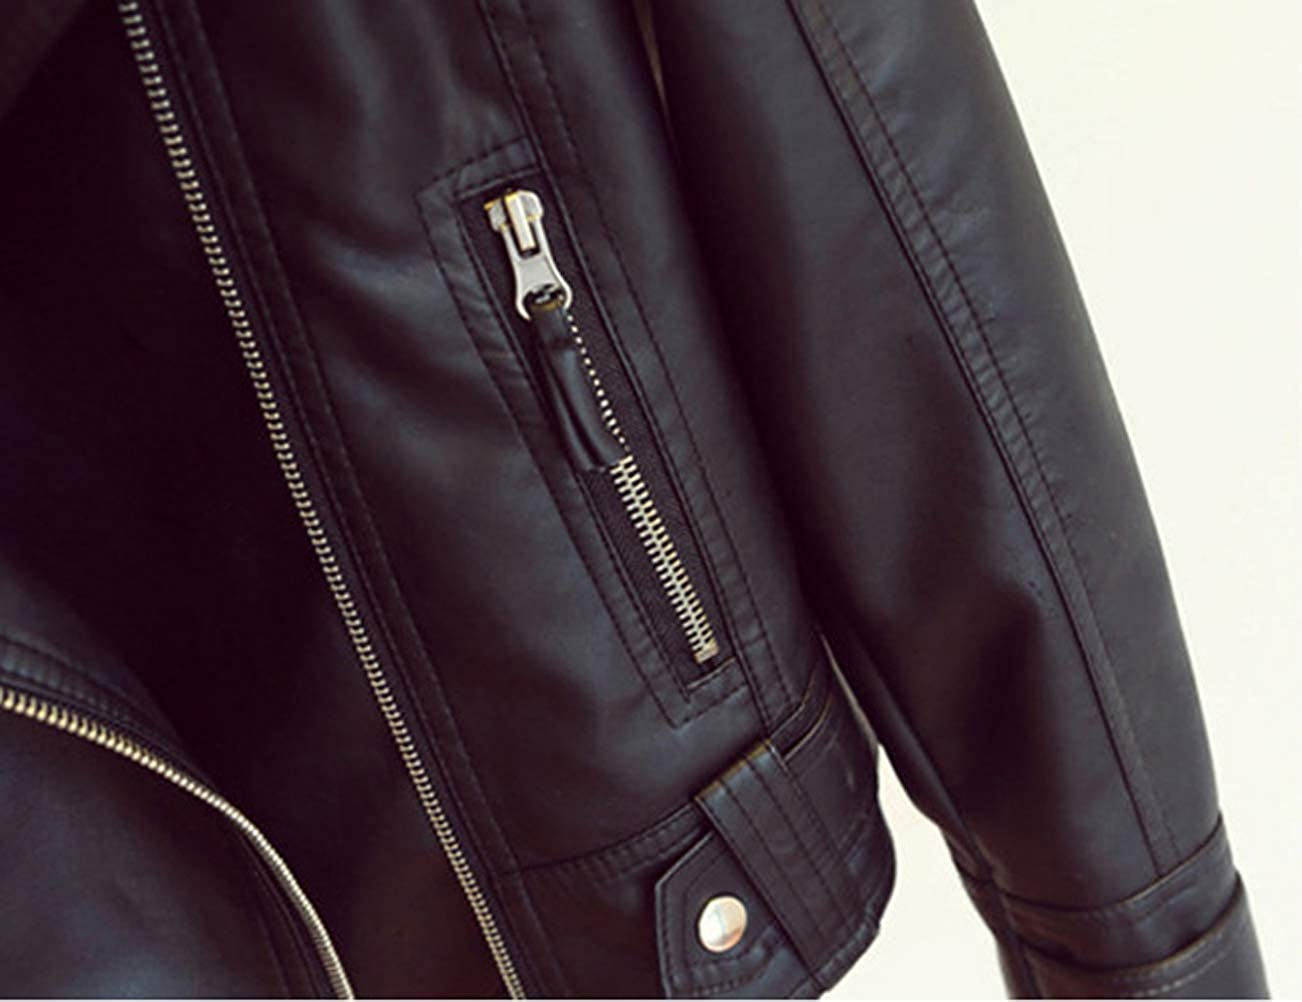 Minetom Damen Kunstleder Biker Jacke Kurz Übergangsjacke Leder Optik Bikerjacke Langarm Reißverschluss Herbst Mantel mit Kette C Schwarz